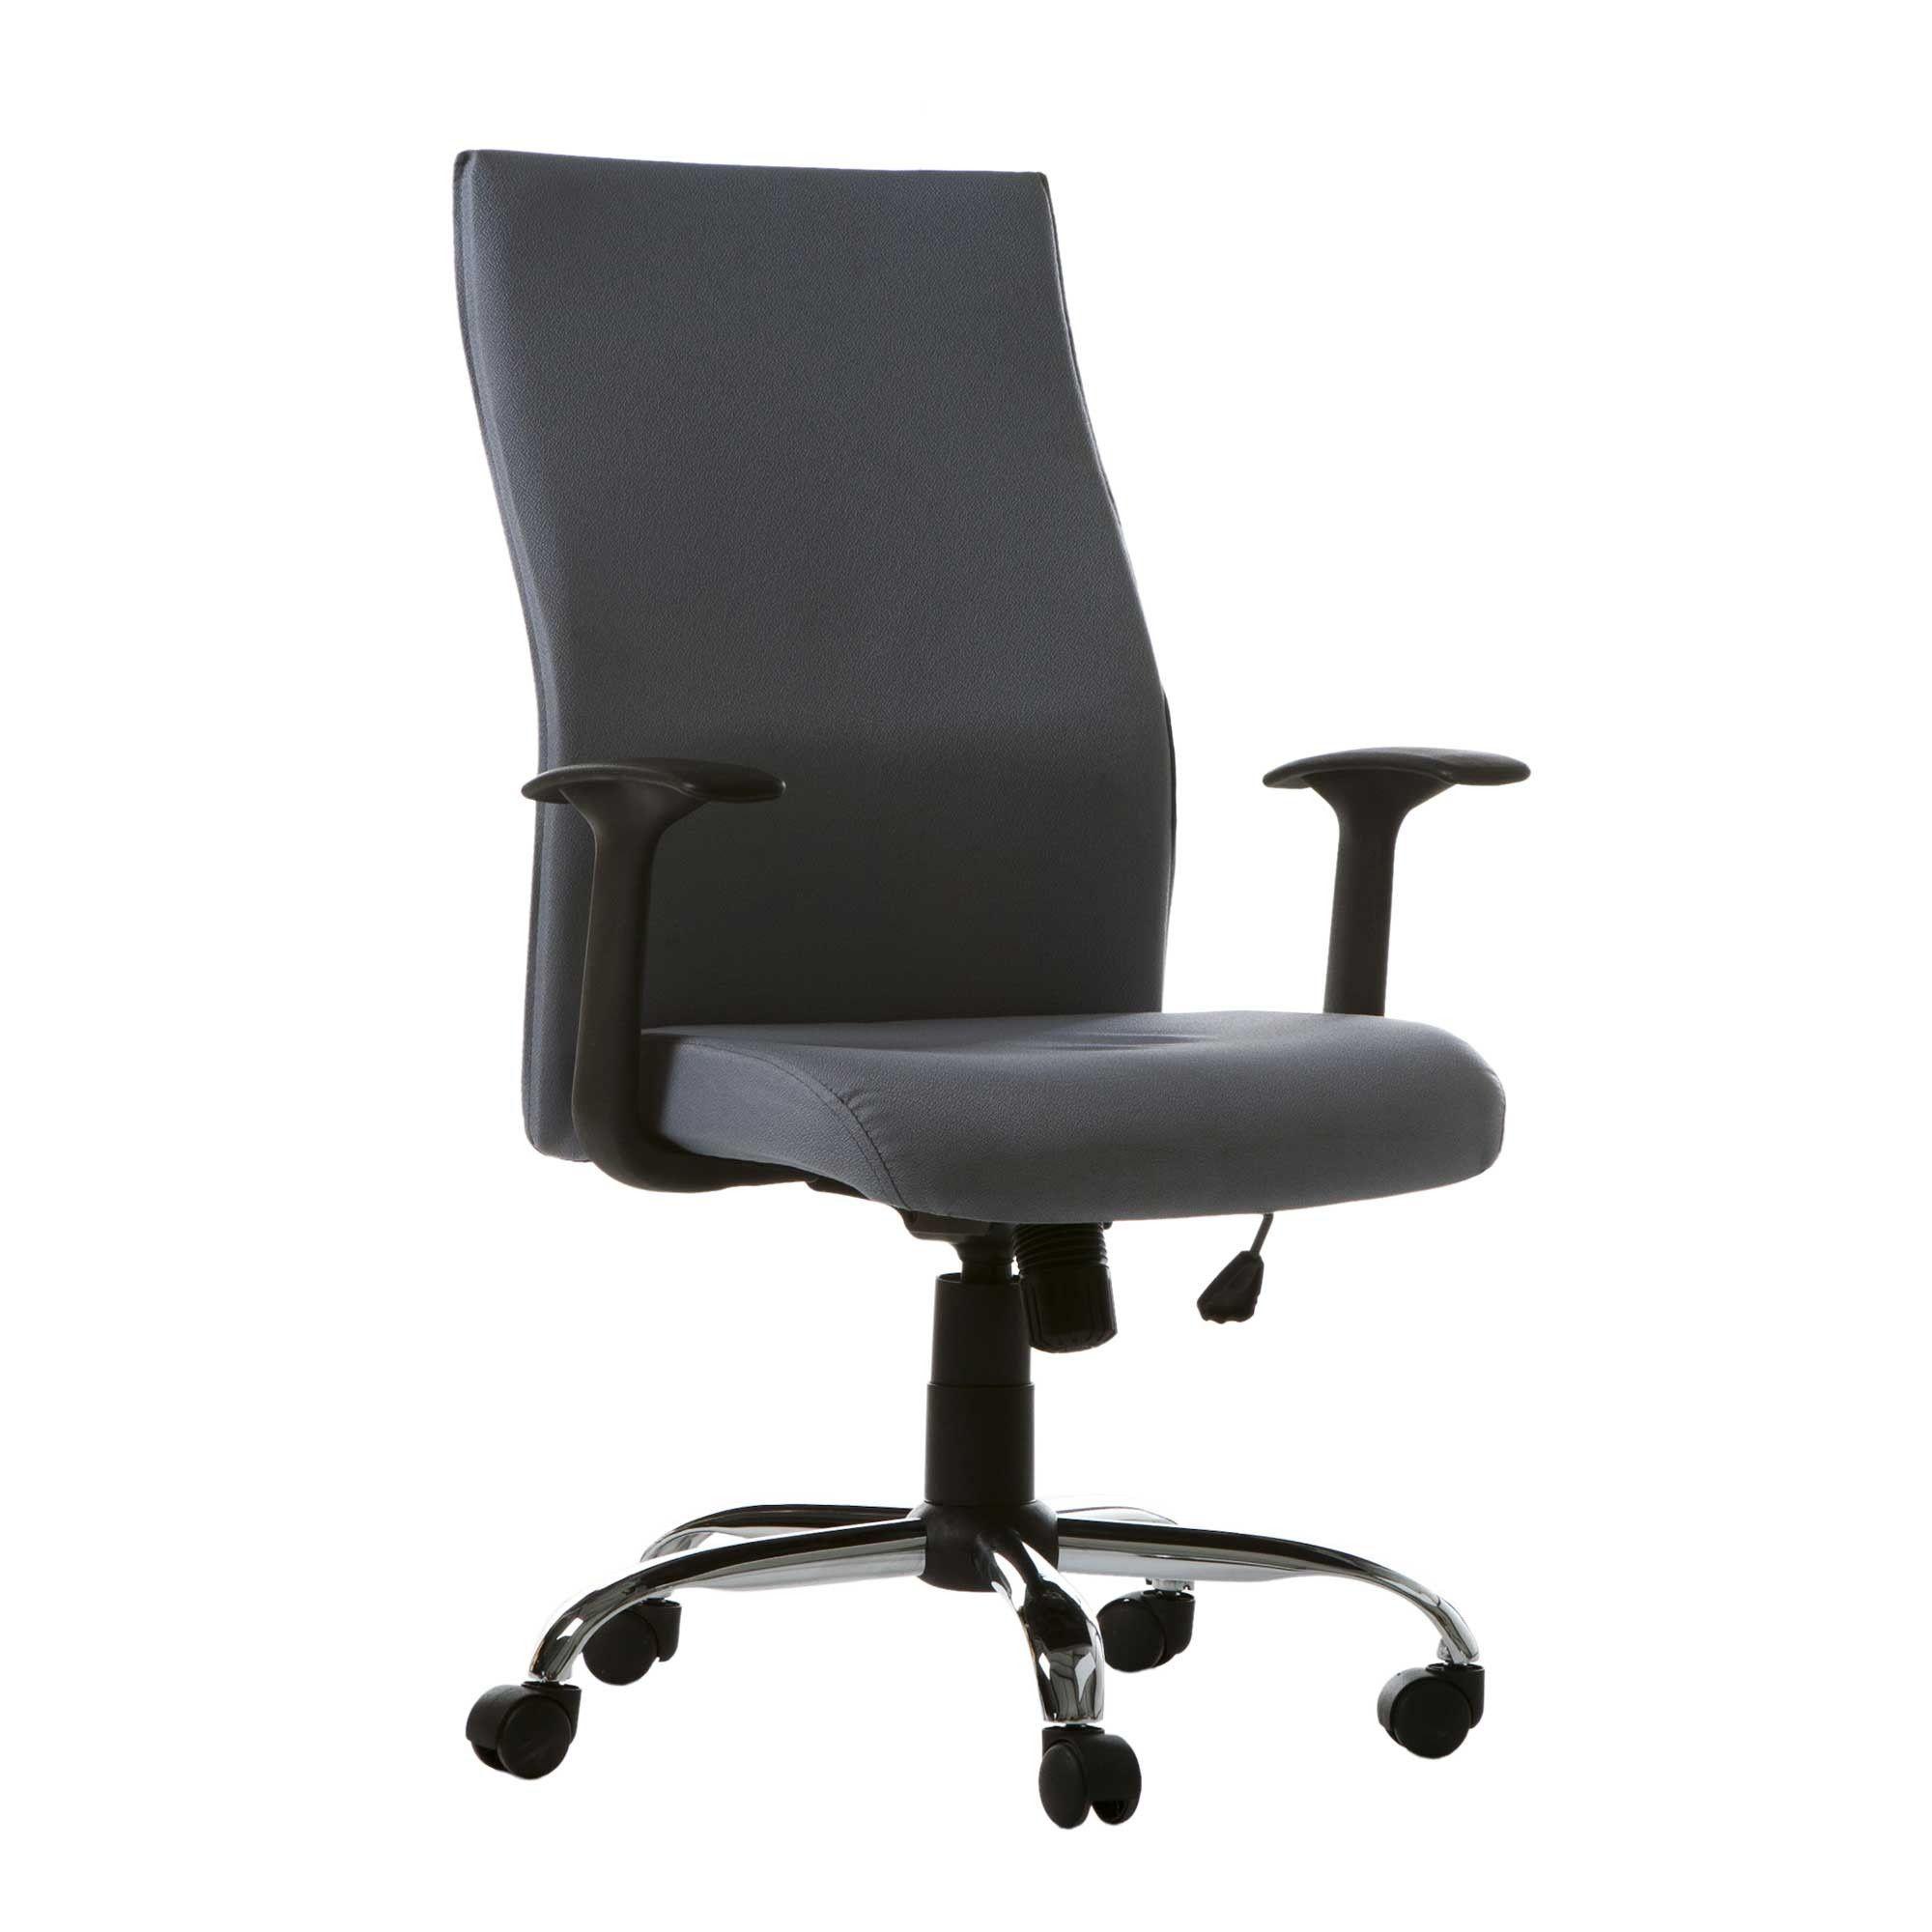 clutch gaming chair pewdiepie 100m